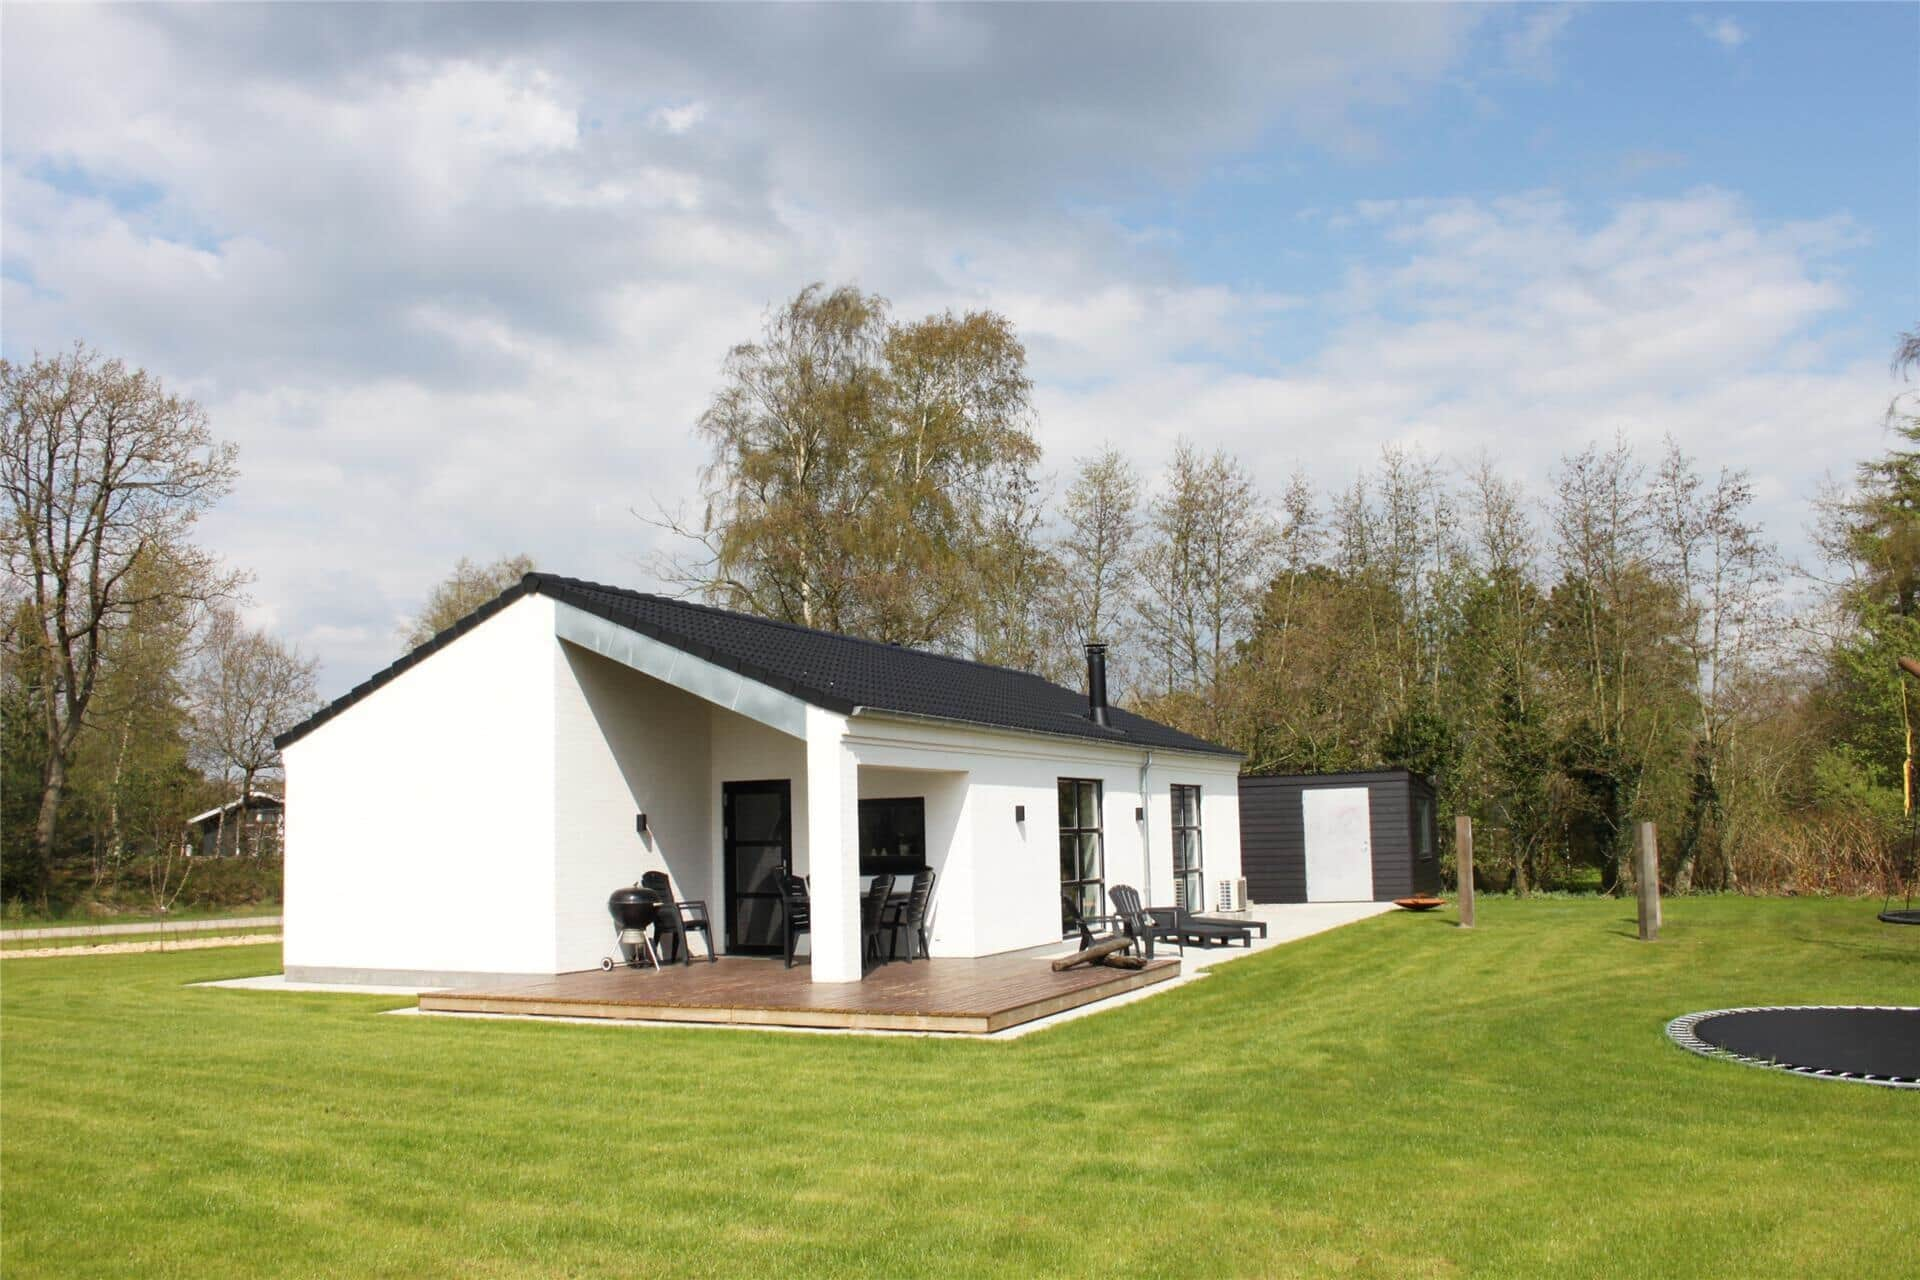 Bild 1-3 Ferienhaus L15081, Illeris 72, DK - 9640 Farsø